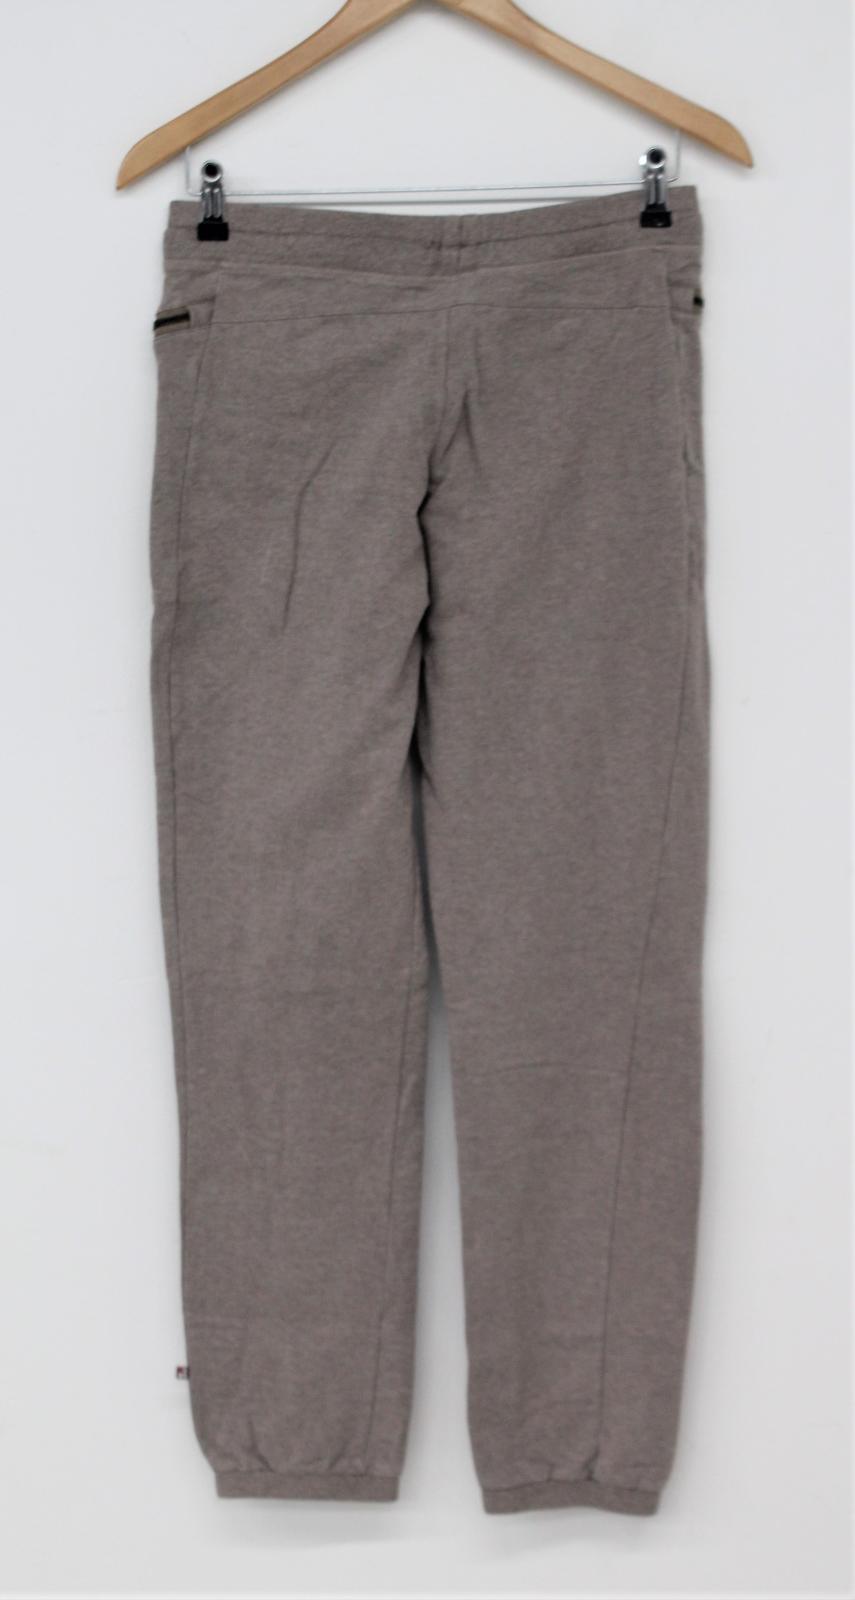 Sweaty-Betty-Damas-Malva-Mezcla-de-Algodon-Cintura-Elastica-Correr-Pantalones-S-W30 miniatura 3